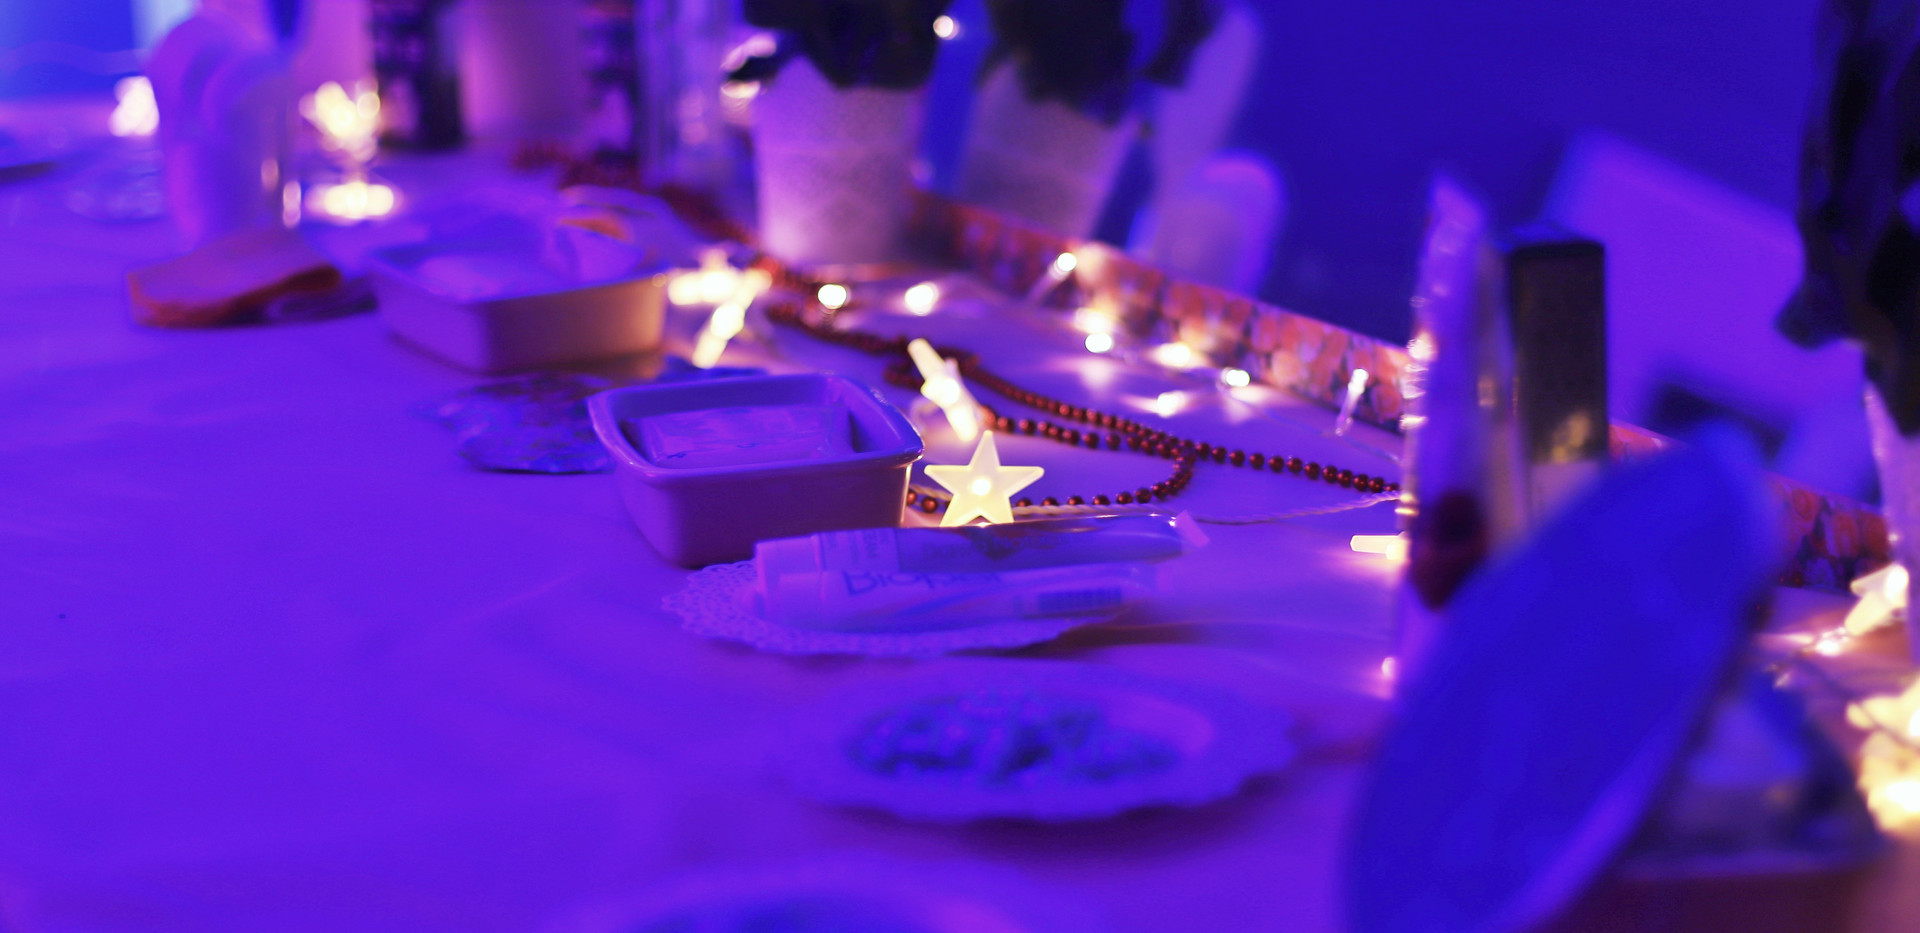 mesa de mascarilla relajante